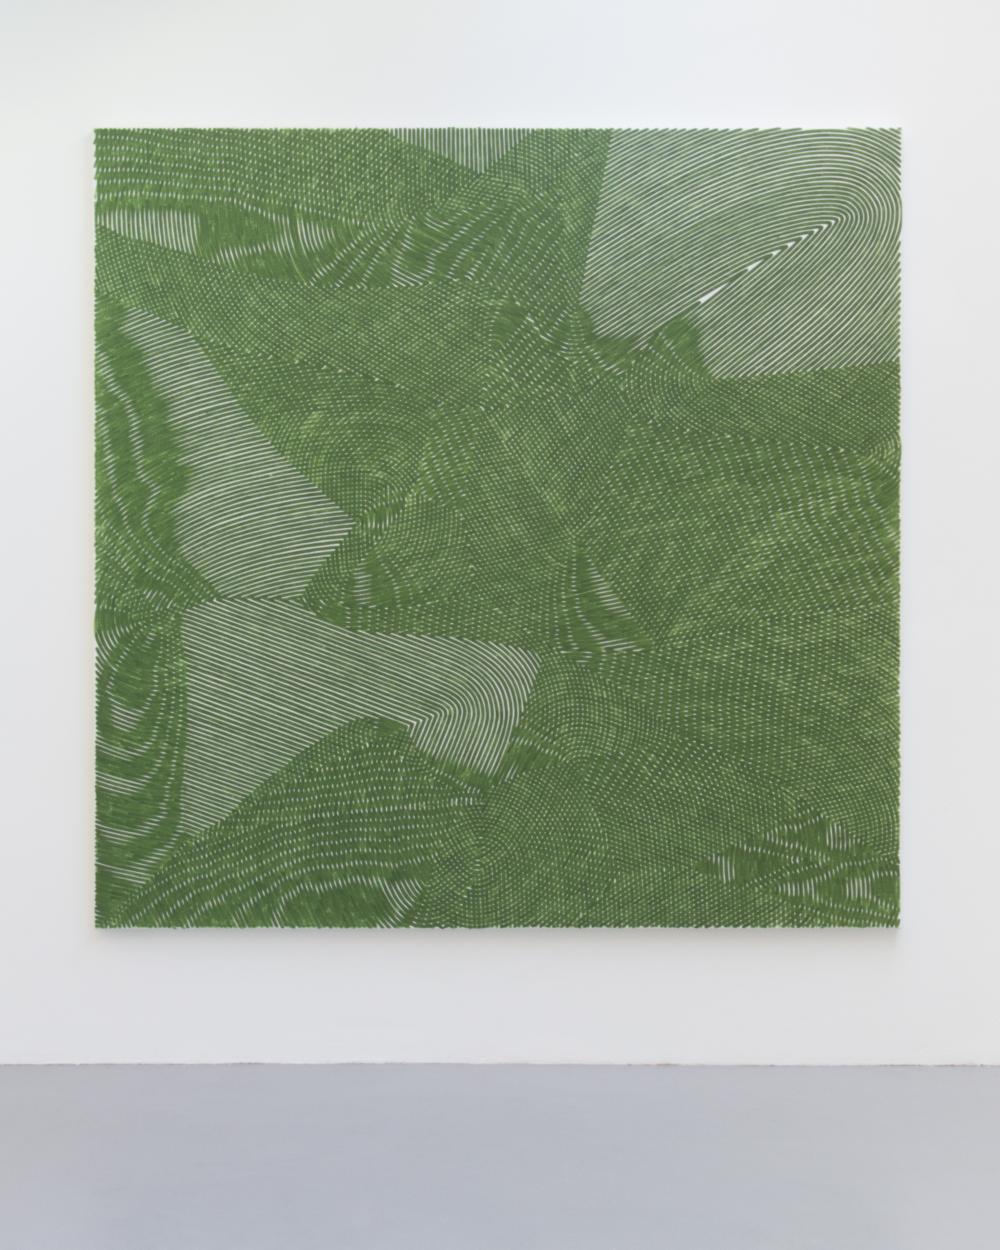 Installation view, Jos van Merendonk,The promise of tradition, Boetzelaer|Nispen